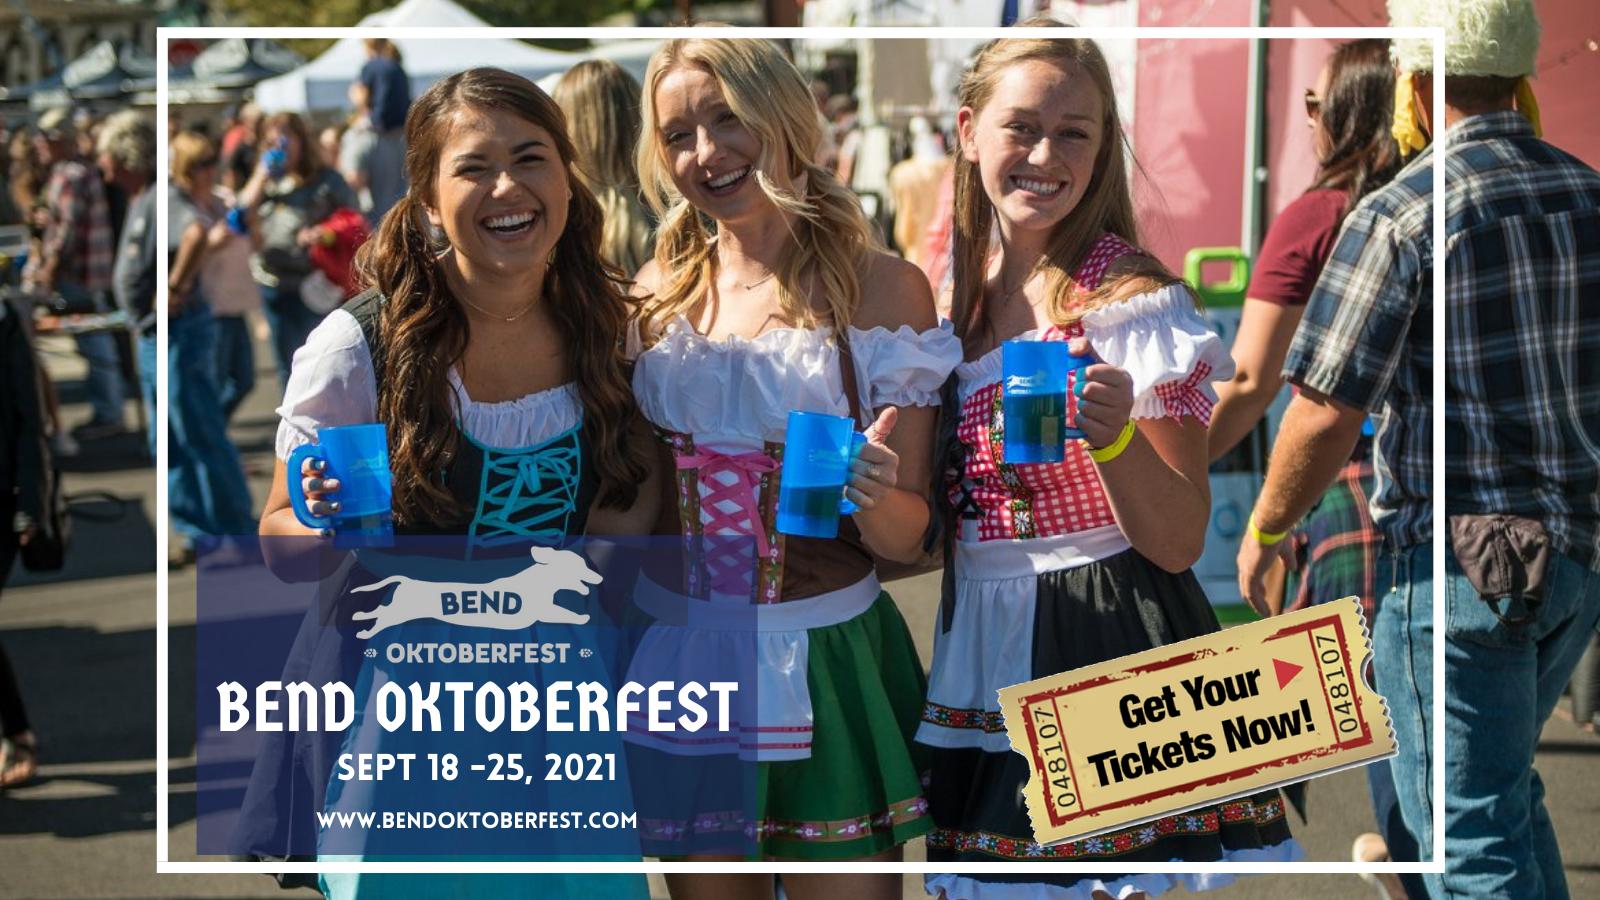 16th Annual Bend Oktoberfest | Sept 2021